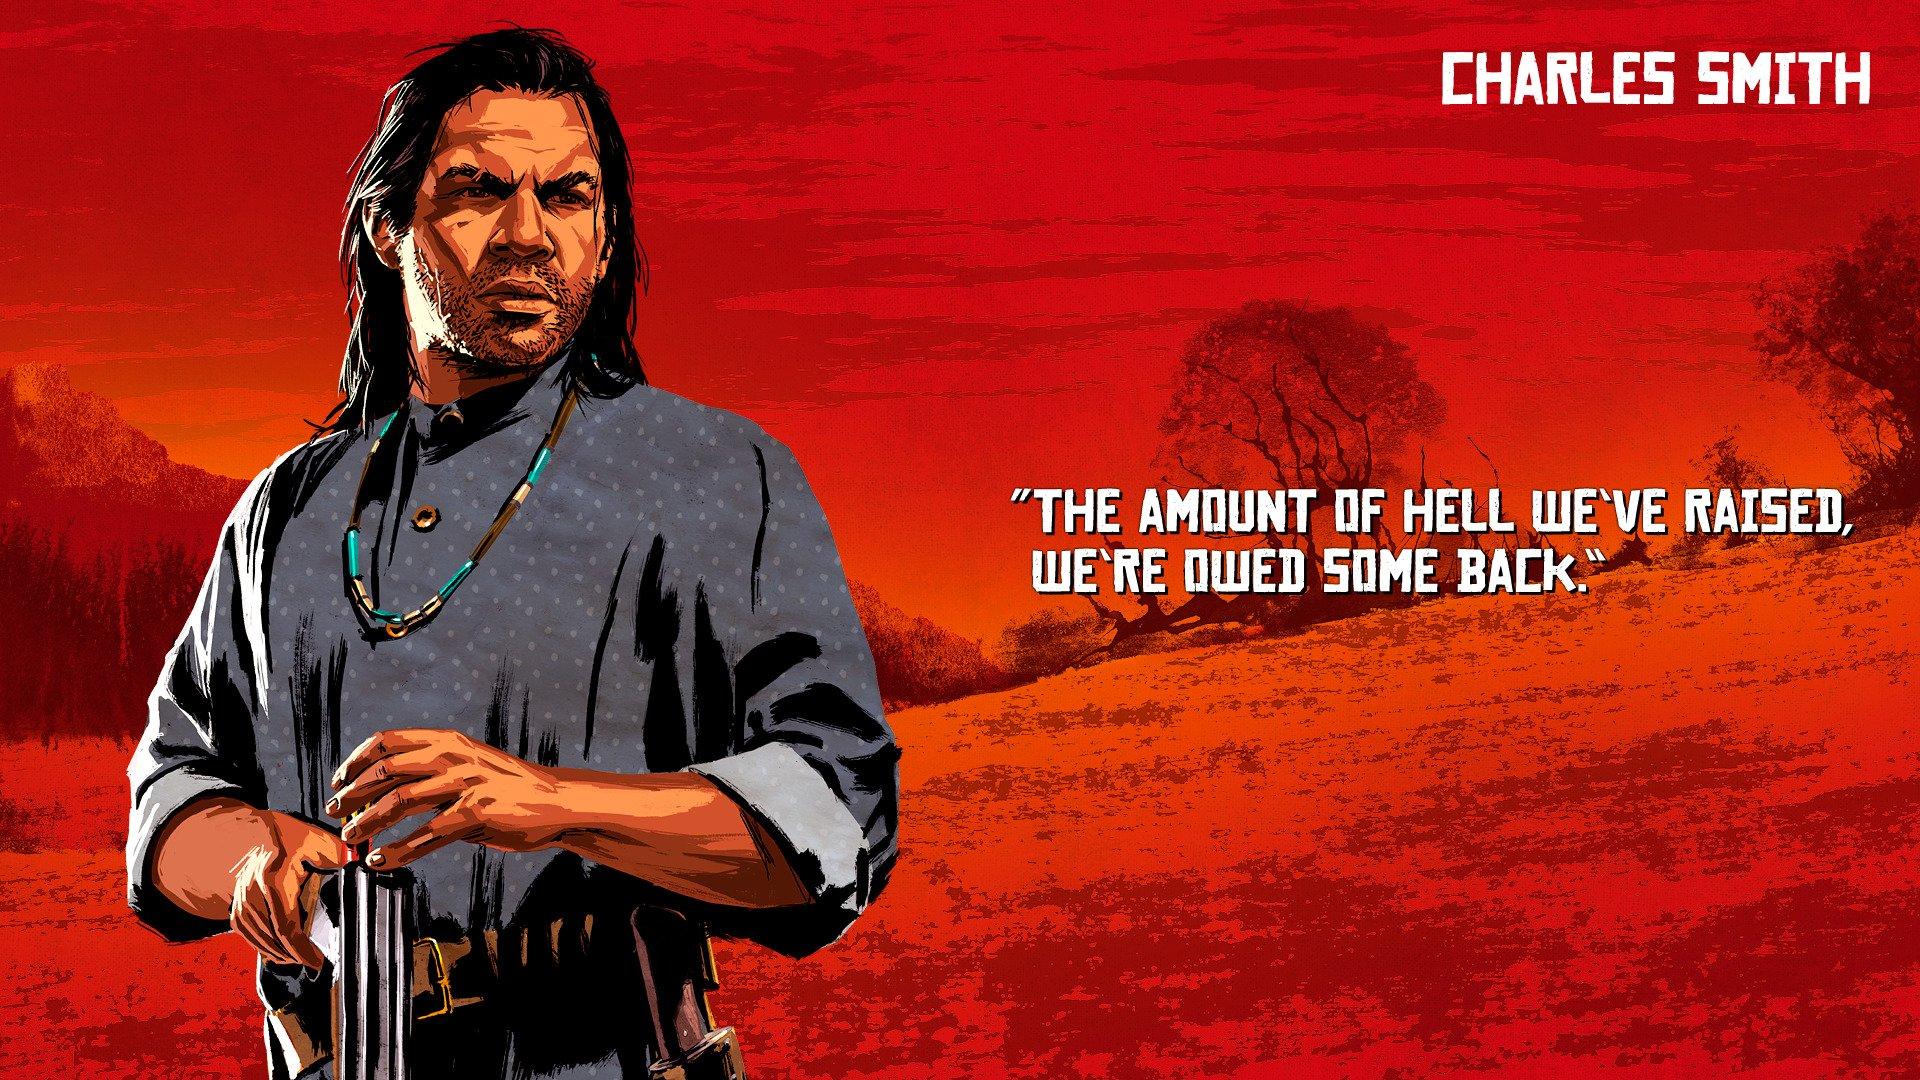 Rockstar Games revela artes dos personagens de Red Dead Redemption 2; veja 5